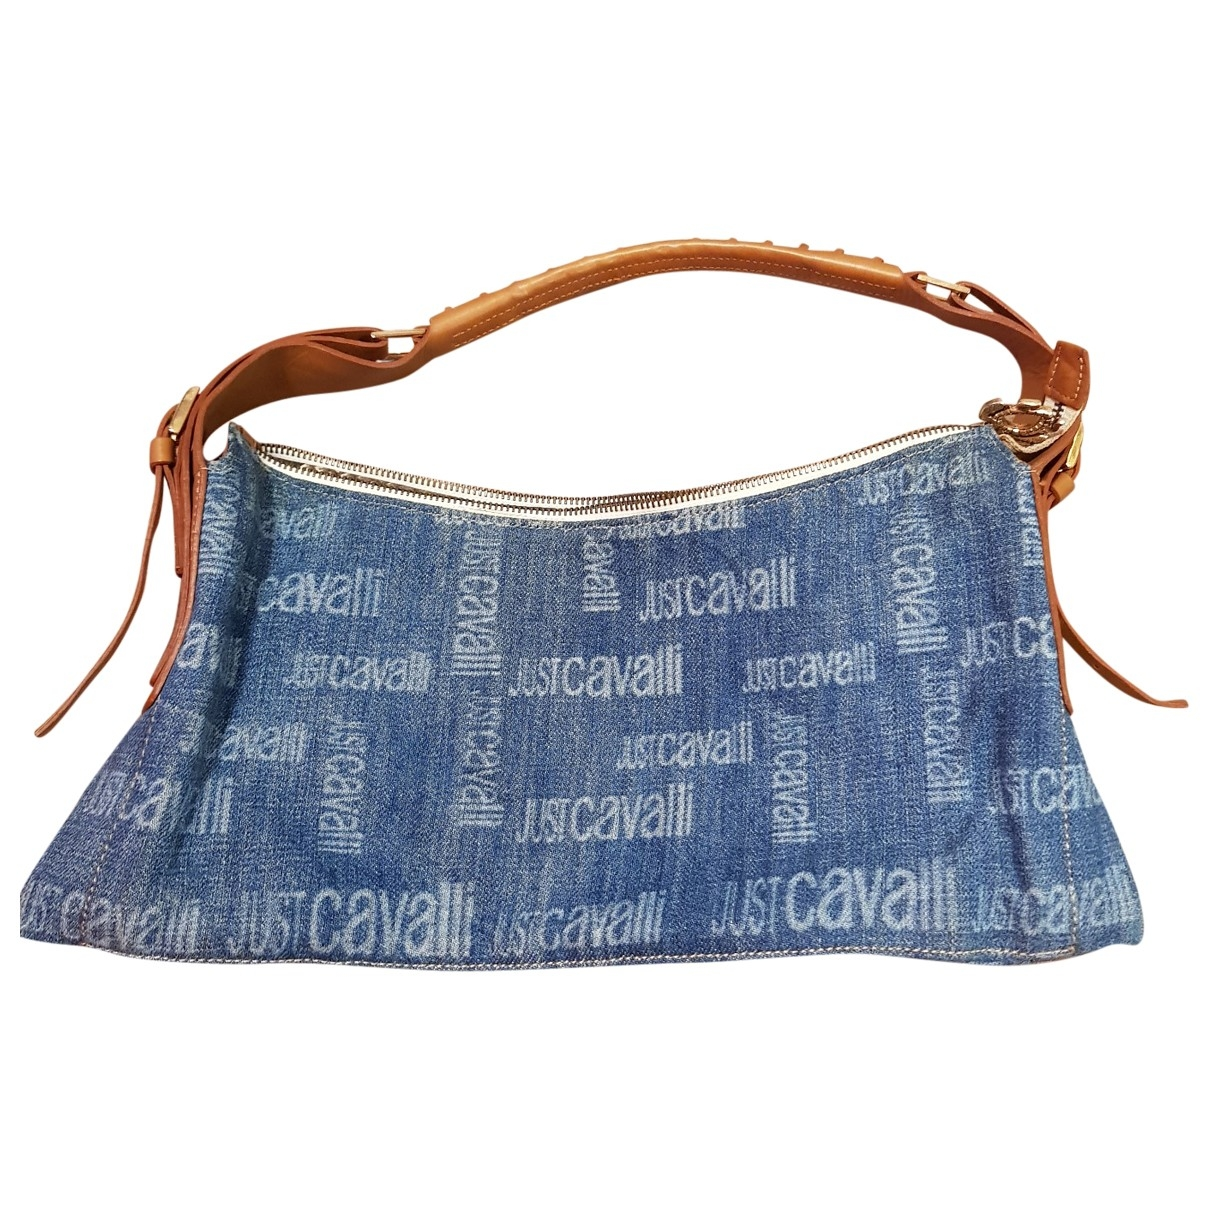 Just Cavalli - Sac a main   pour femme en denim - bleu